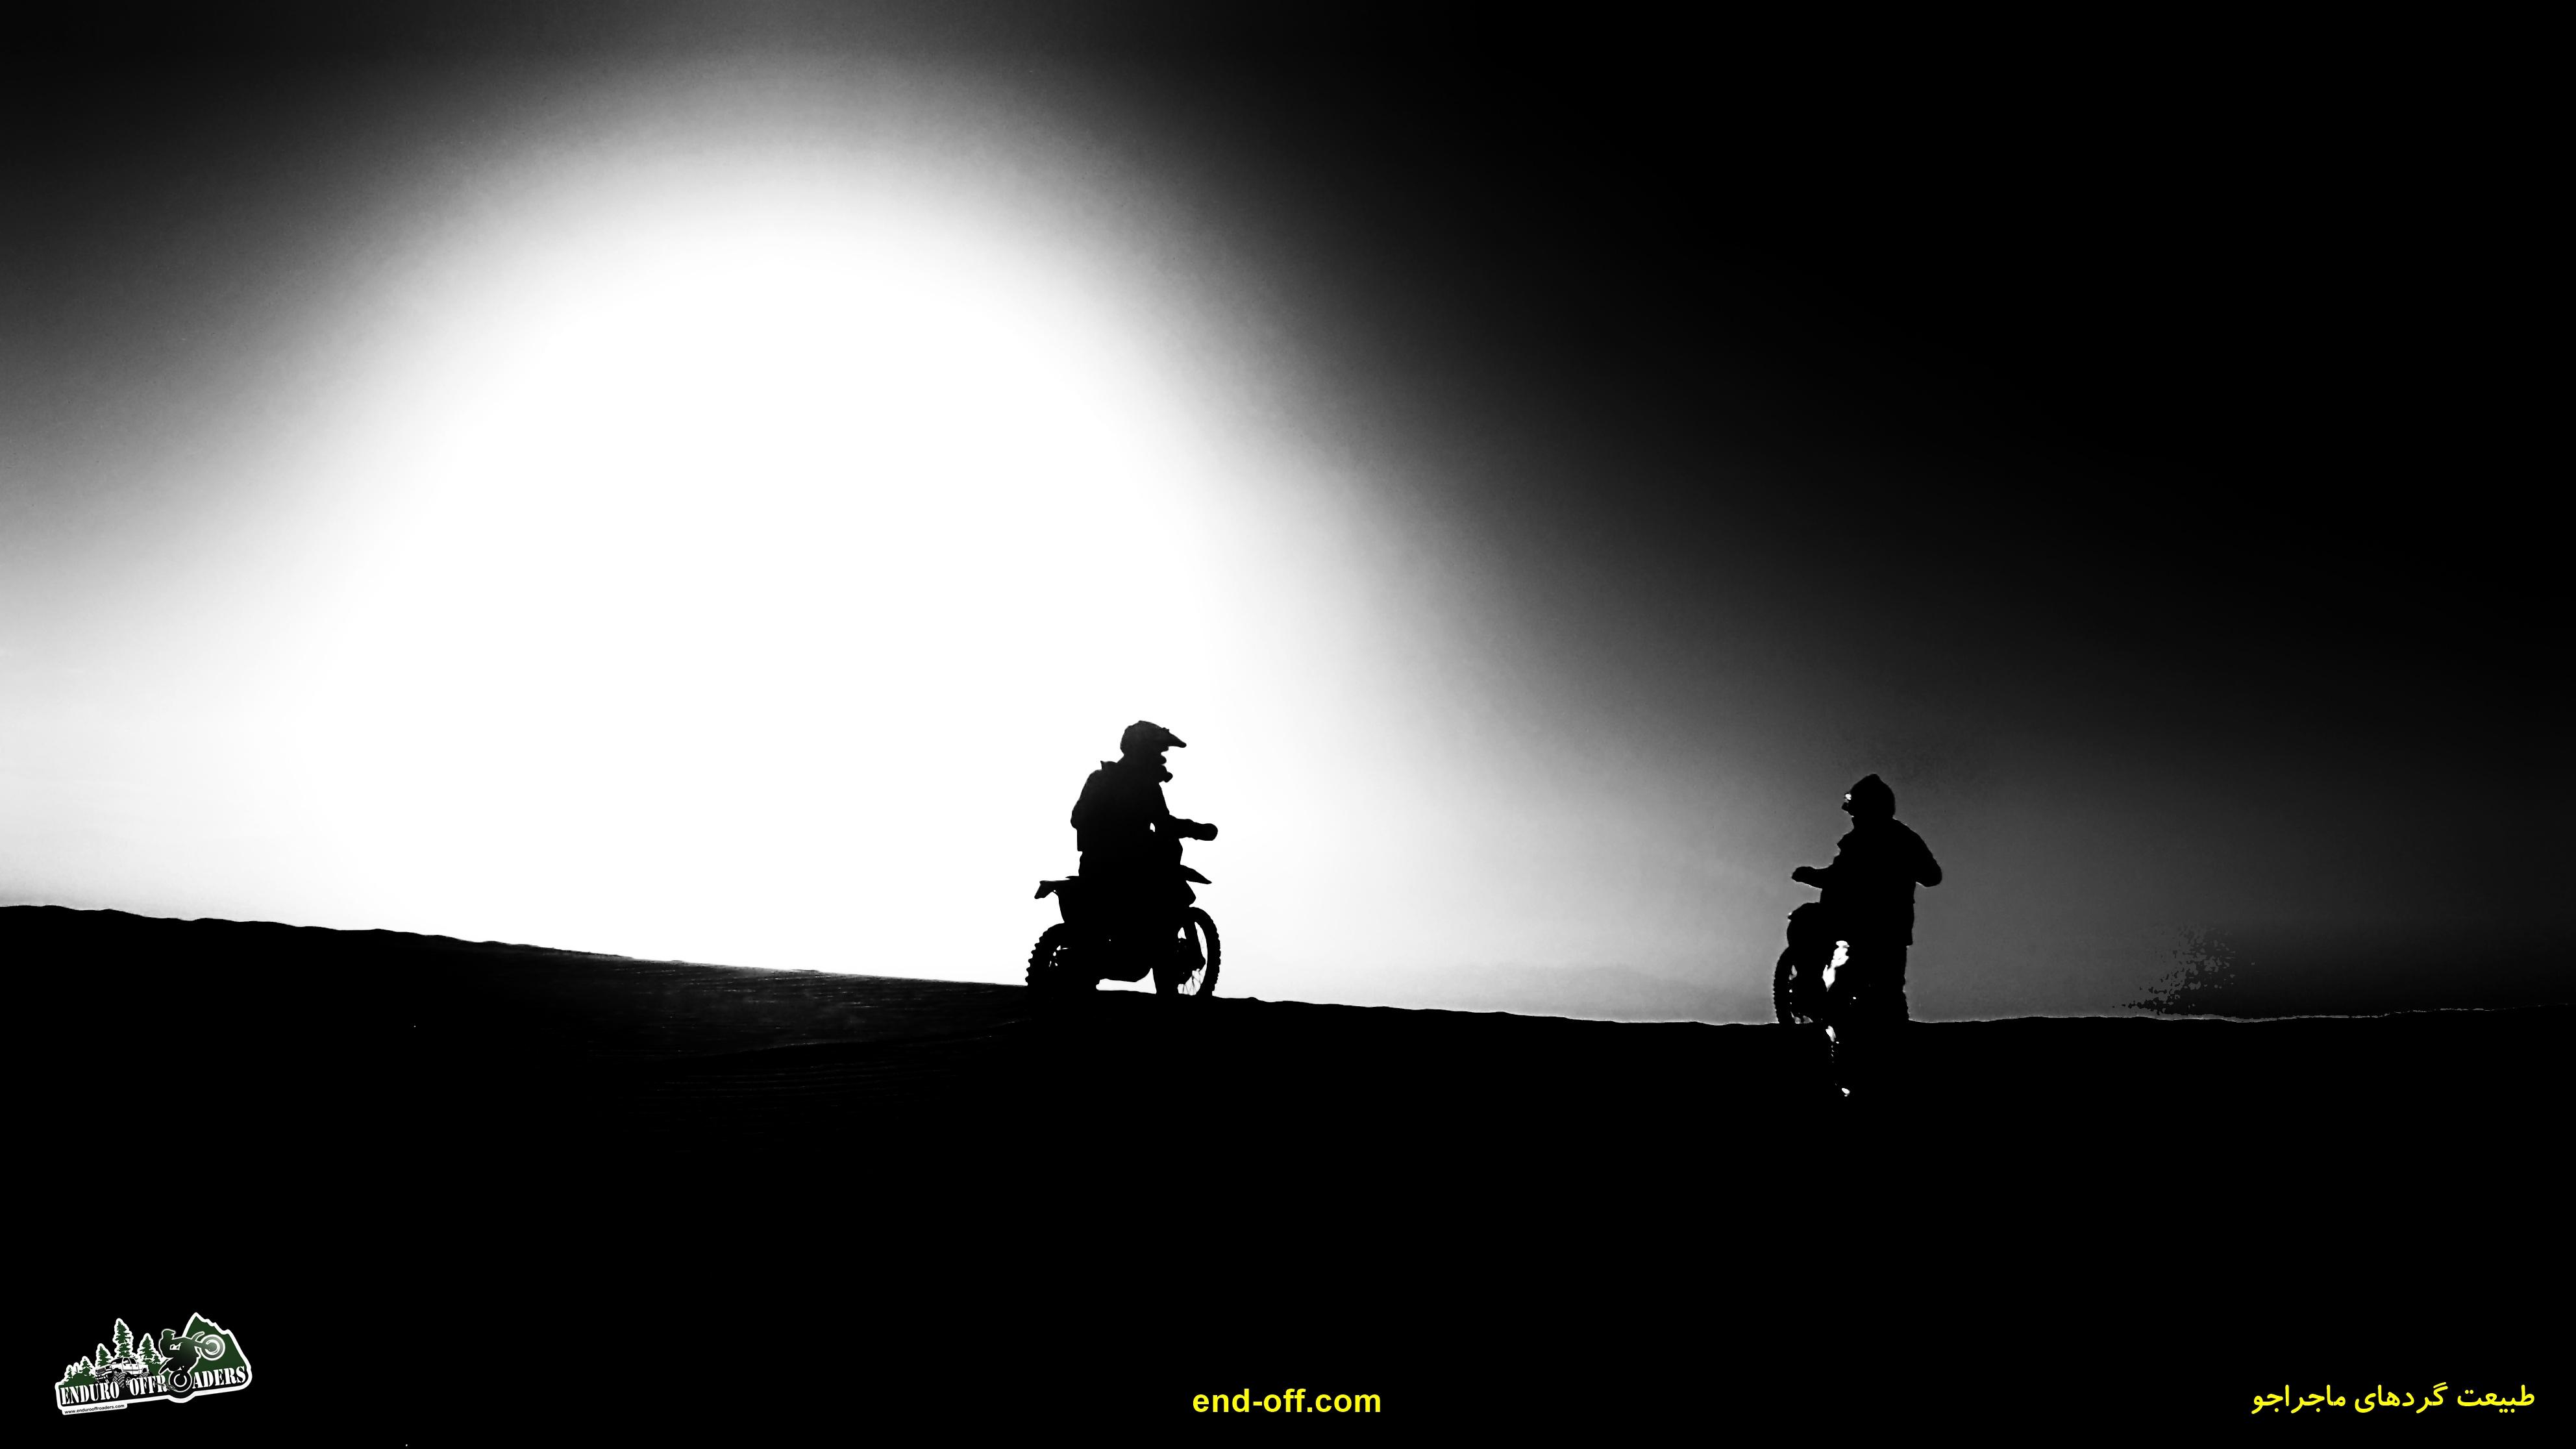 کویر ابوزیدآباد - زمستان 1399 2021